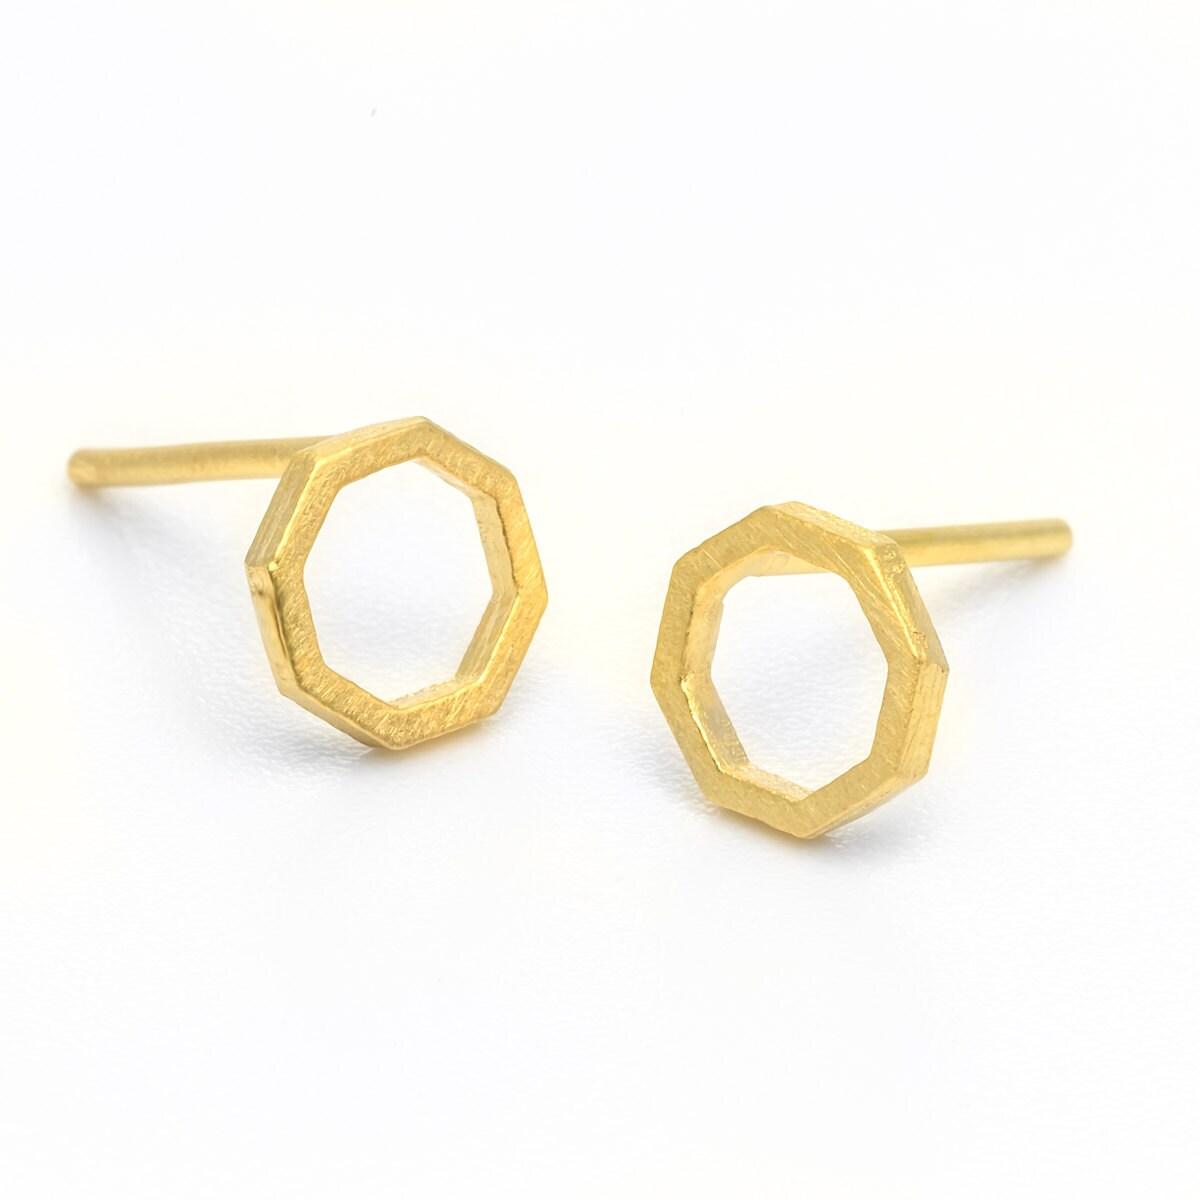 Gold Stud Earrings, Octagon Studs, Gold Geometric Studs, 14k Gold Minimal Stud  Earrings